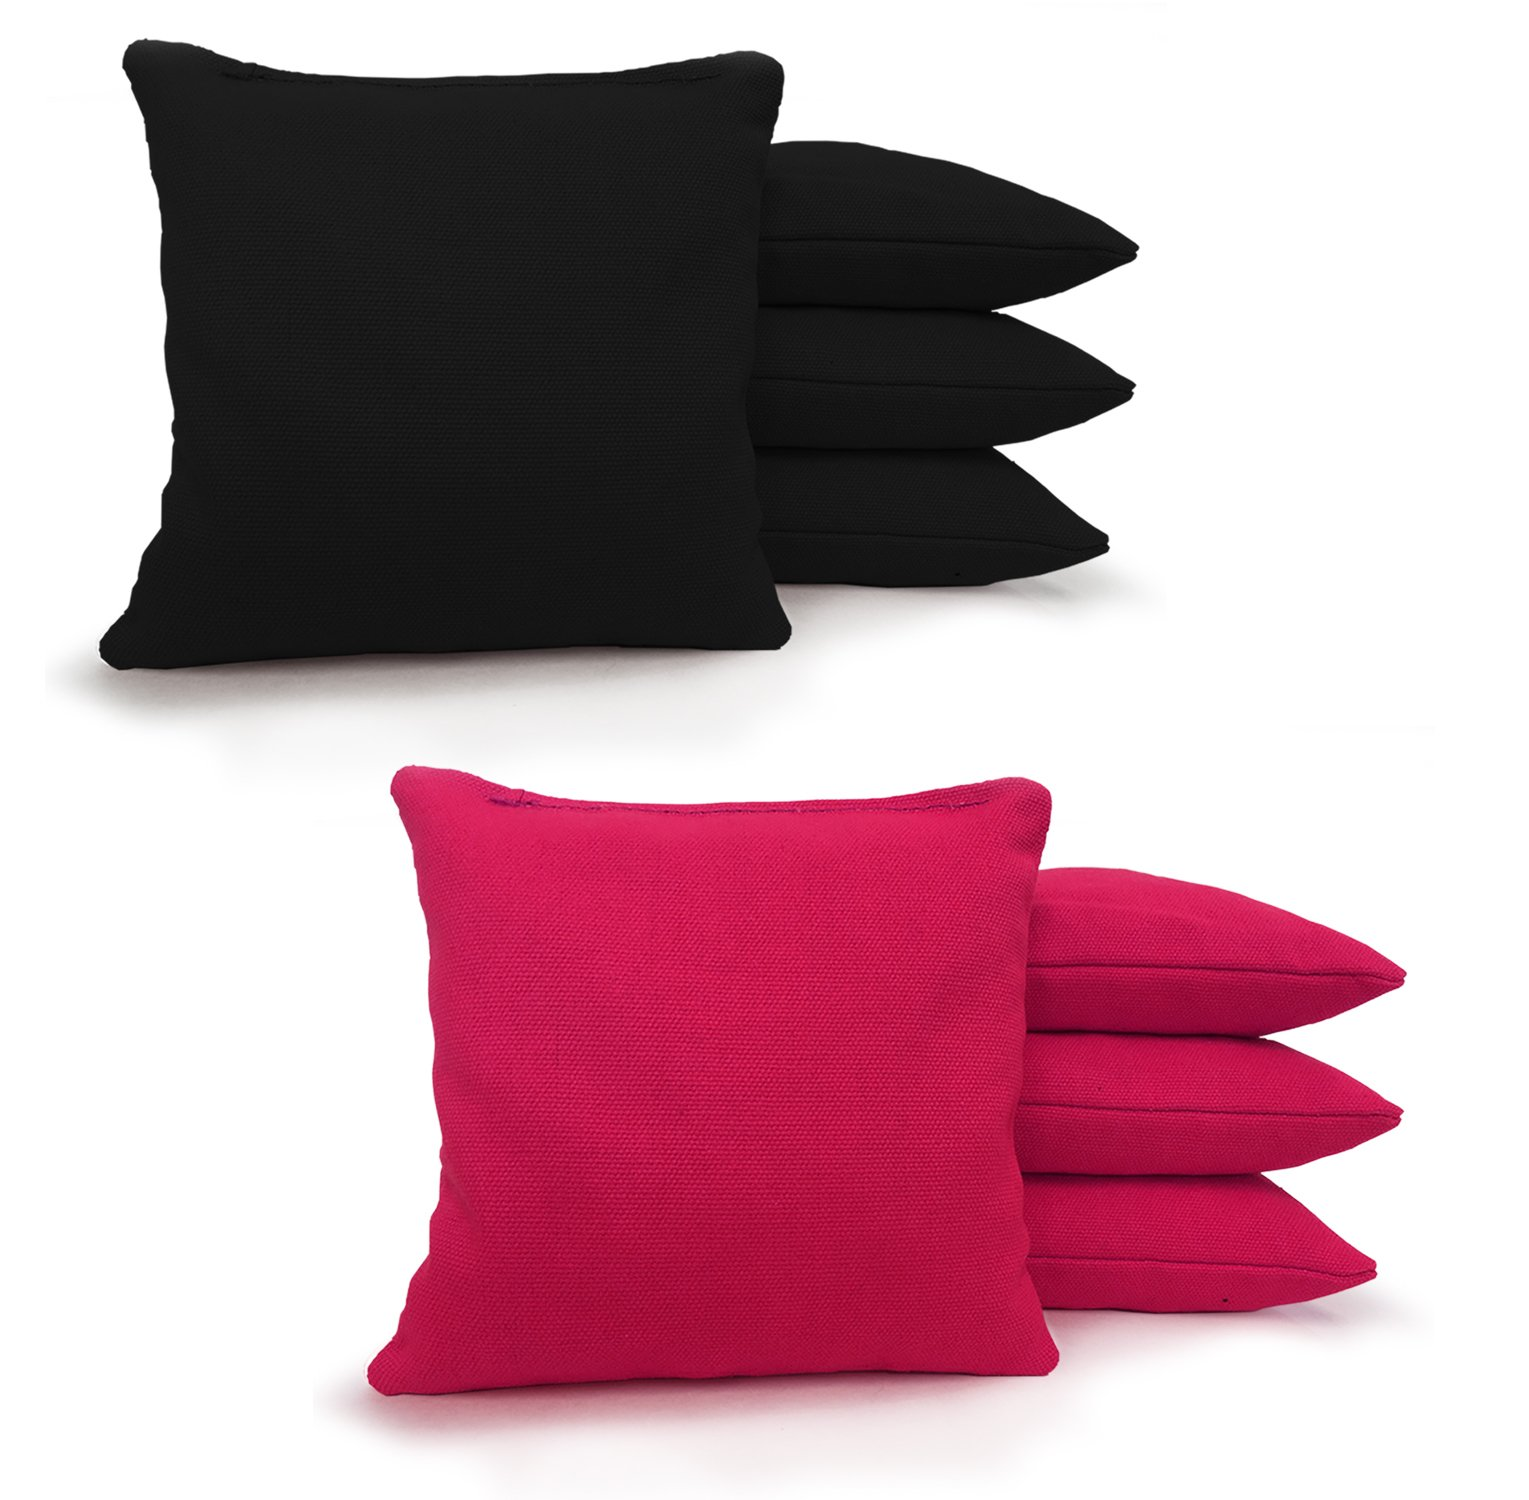 Johnson Enterprises, LLC 8 Standard Corn Filled Regulation Duck Cloth Cornhole Bags! 17 Colors (You Pick)!! (Black/Pink)